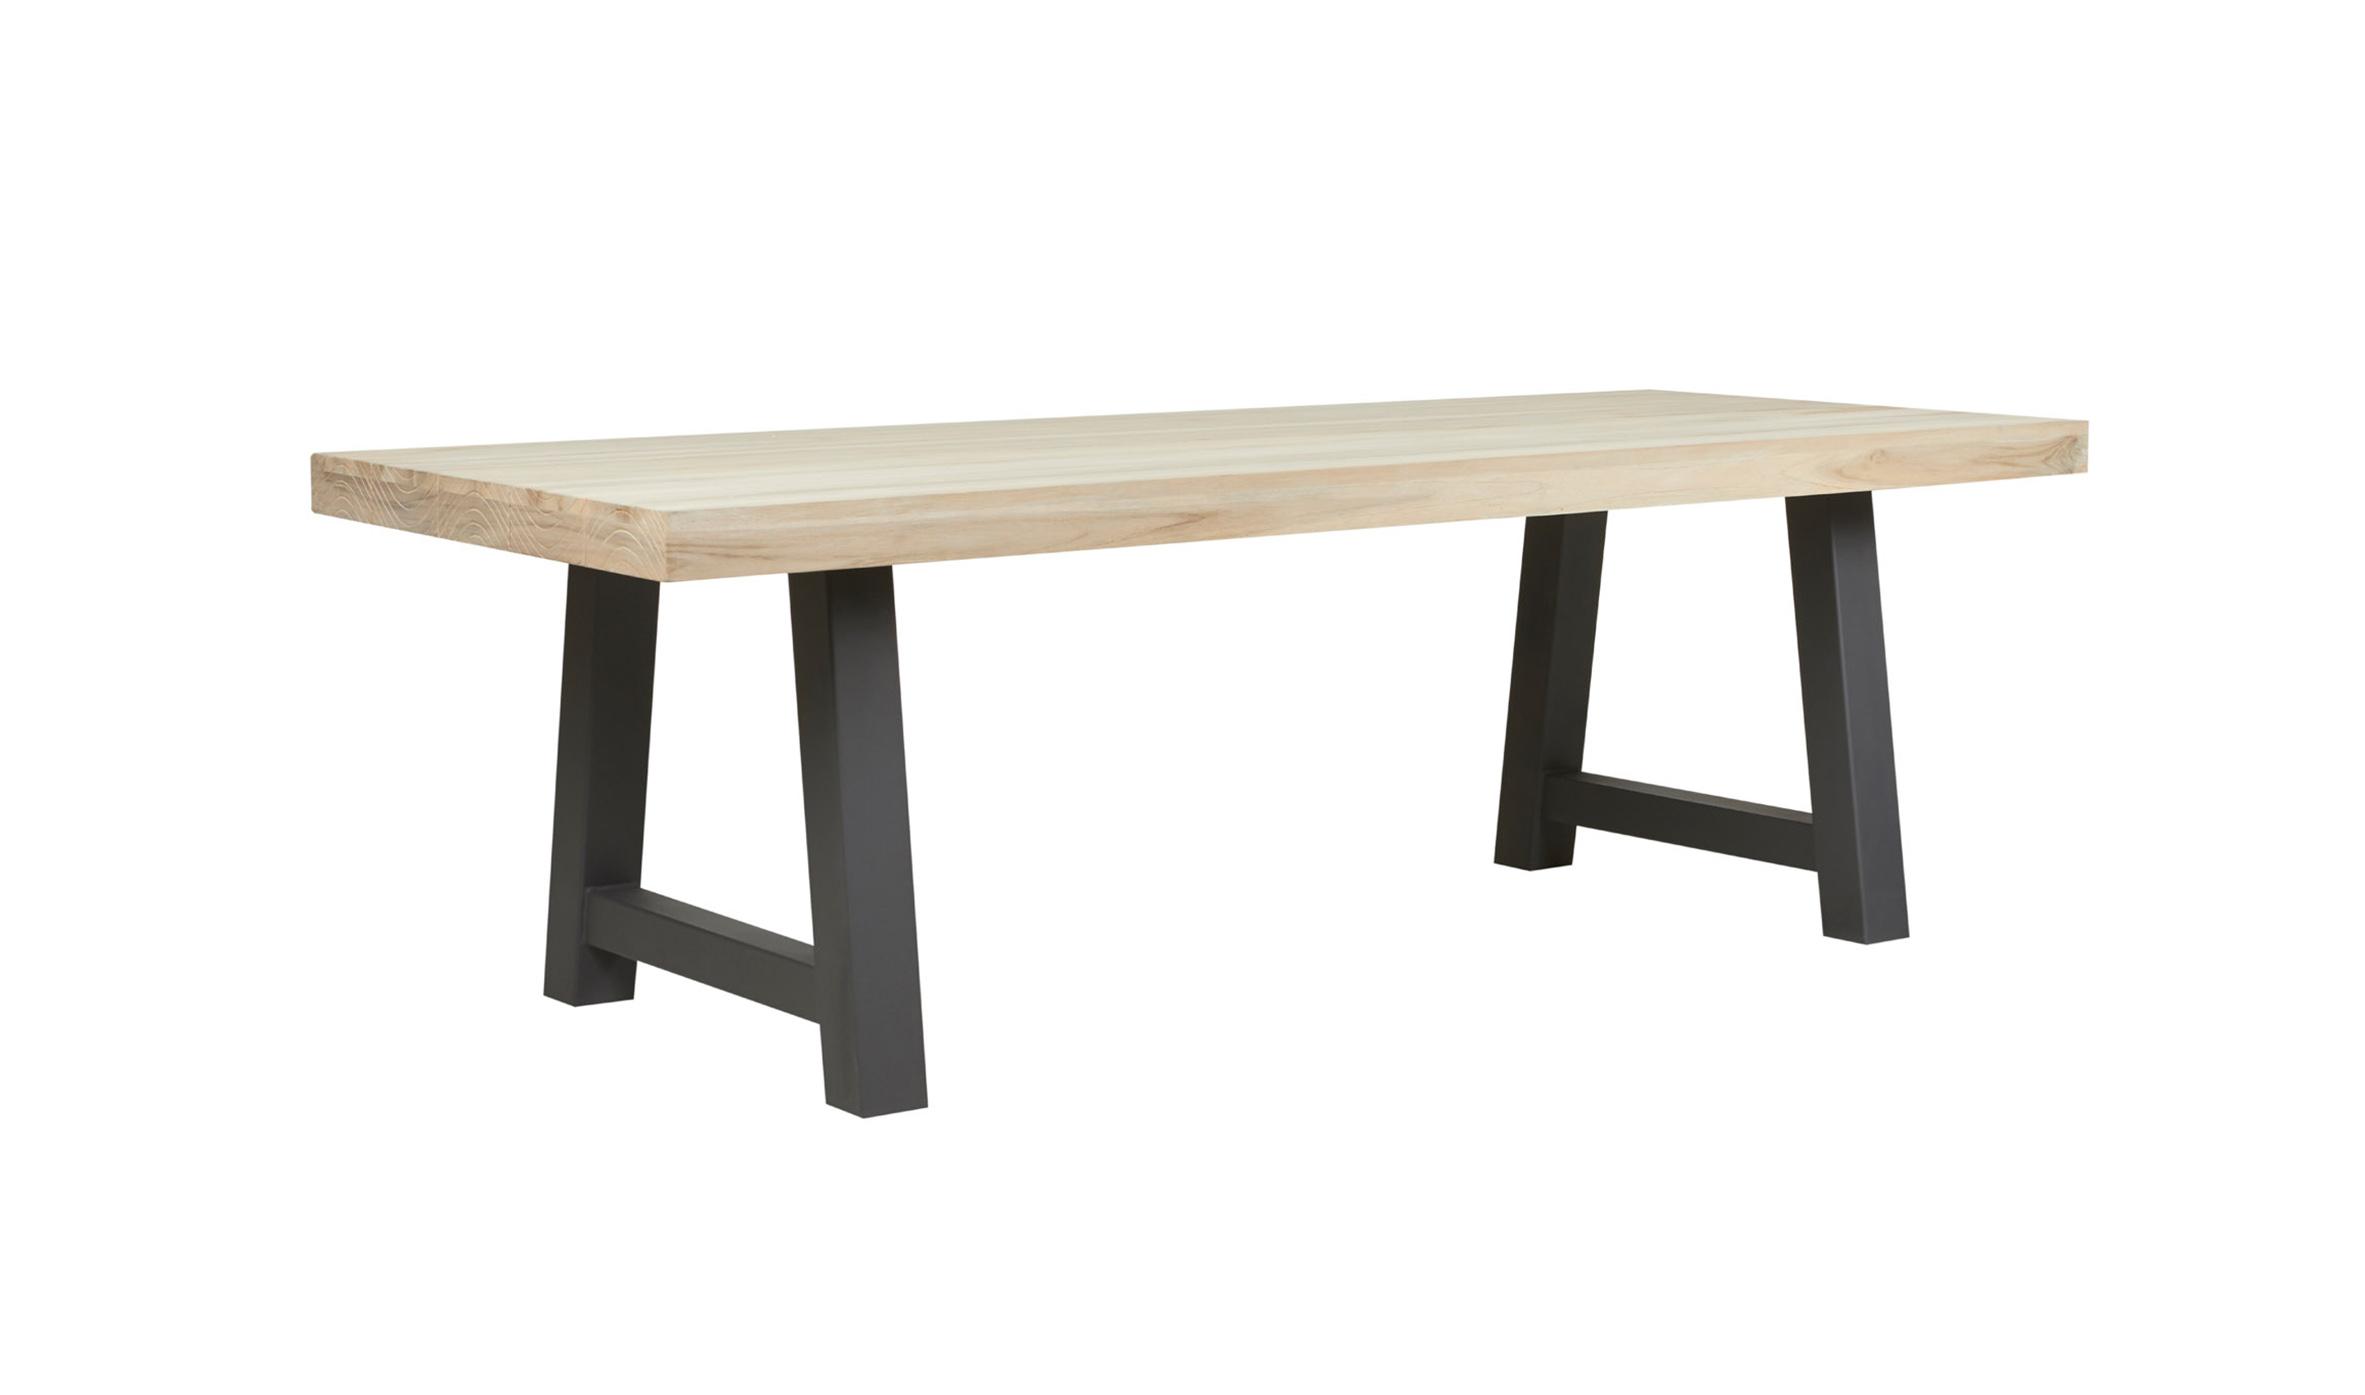 Furniture Thumbnails outdoor-dining-tables-granada-beach-granada-beach-tab-8S